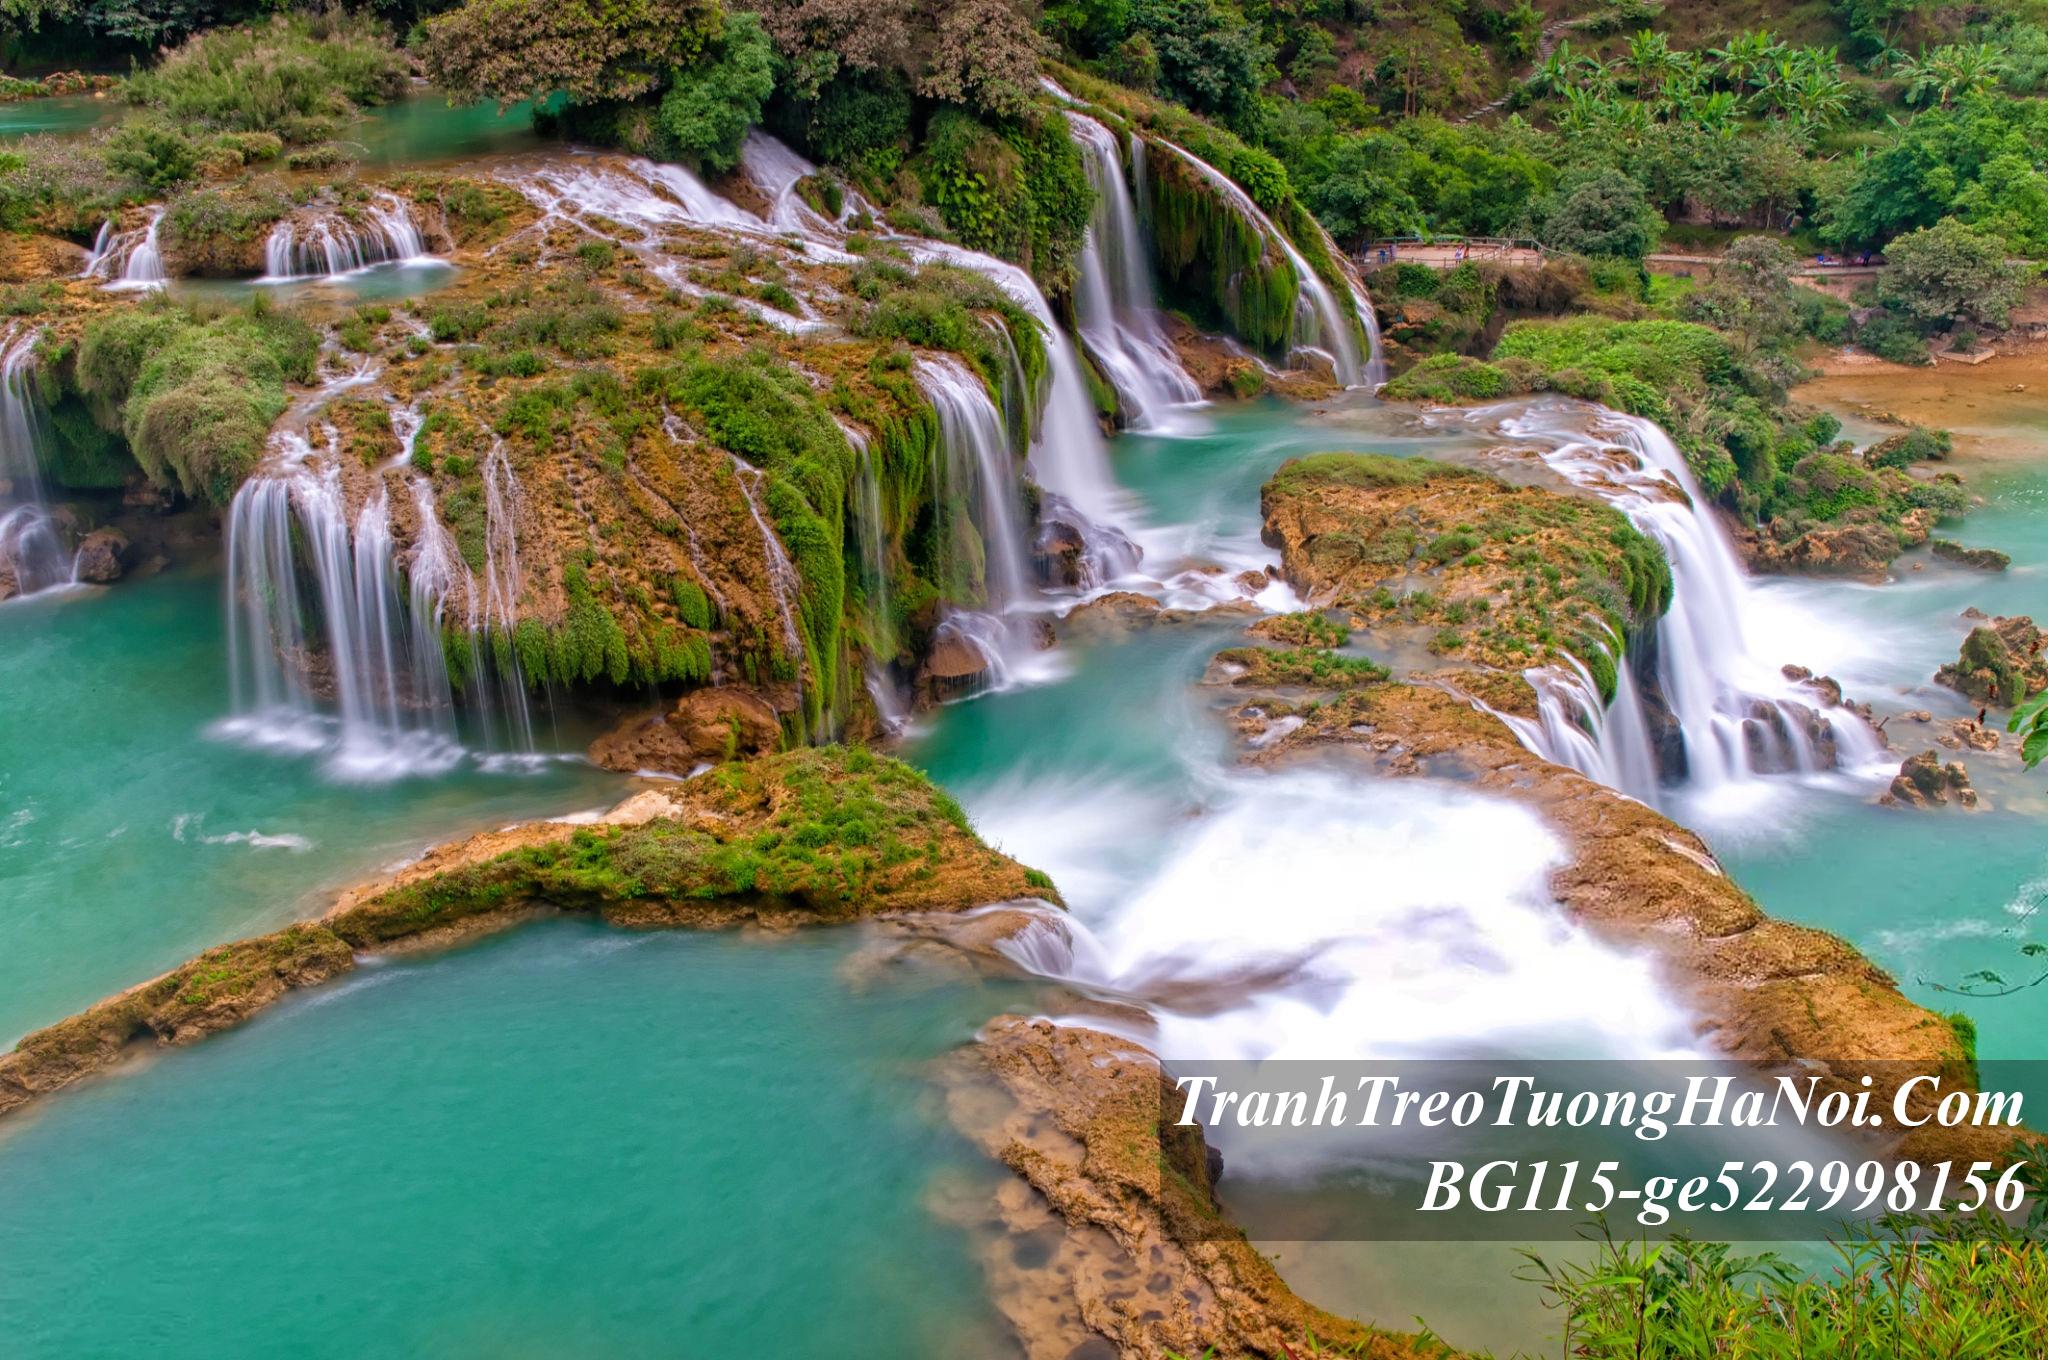 Phong canh thac nuoc dep treo phong khach BG115-ge522998156